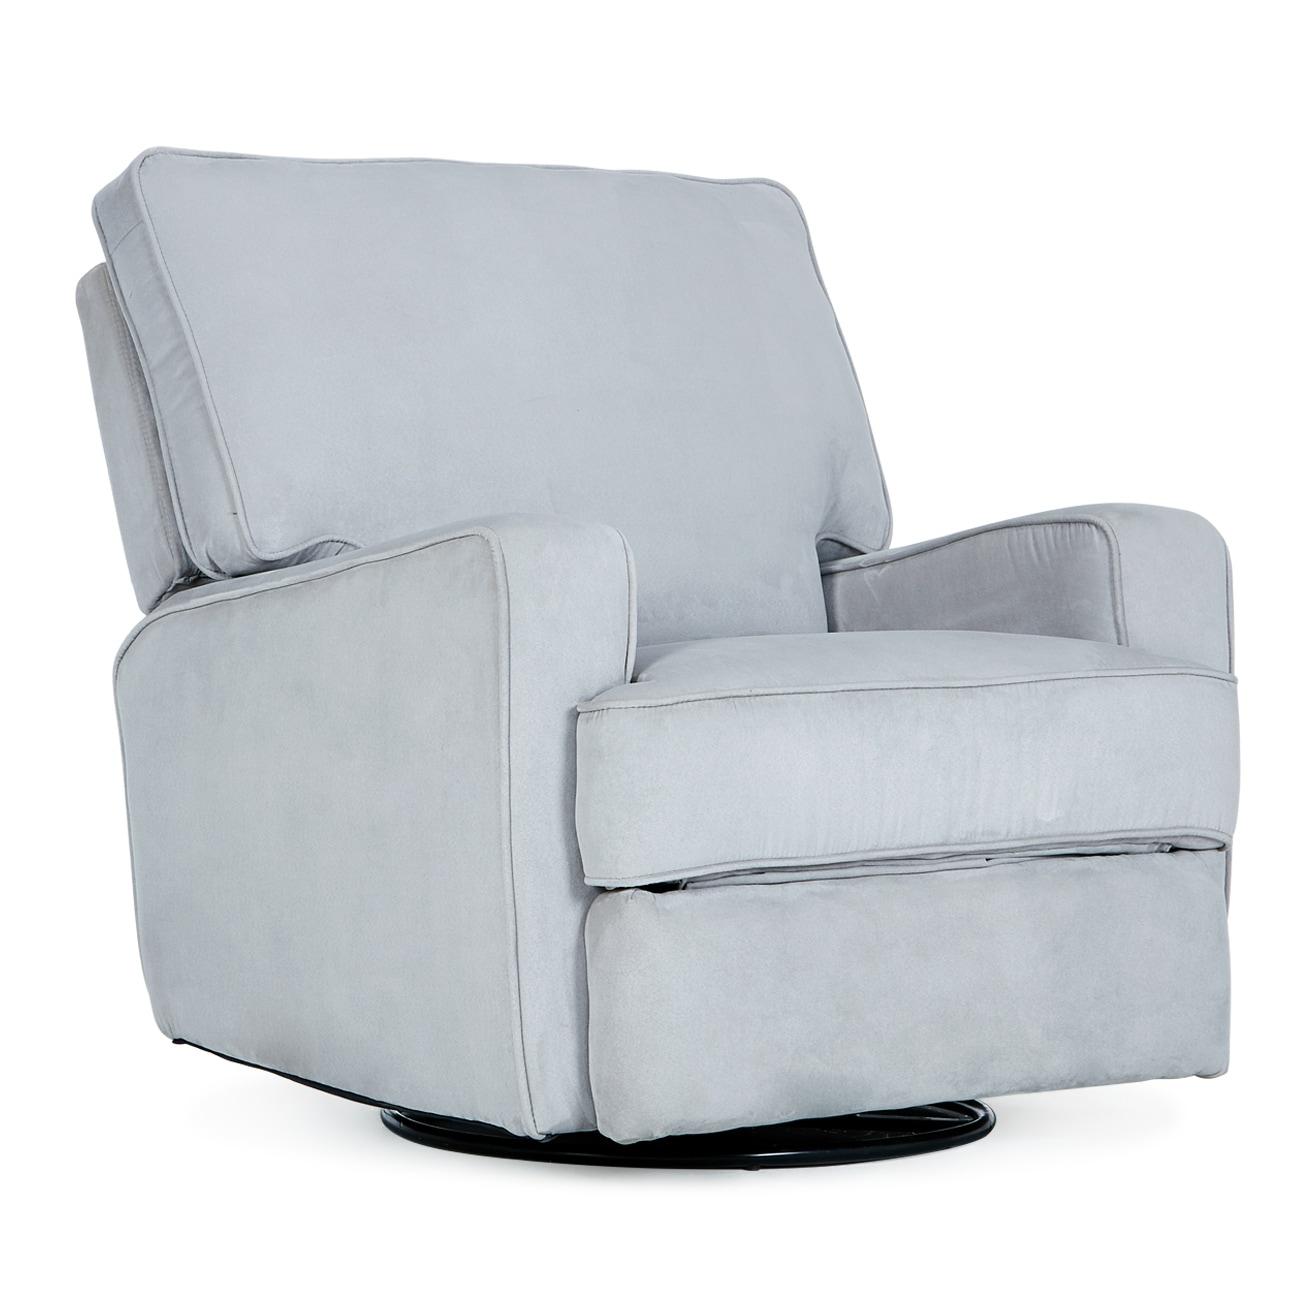 Belleze Swivel Glider Recliner Padded Backrest W Extra Cushion Linen Living Room Chair